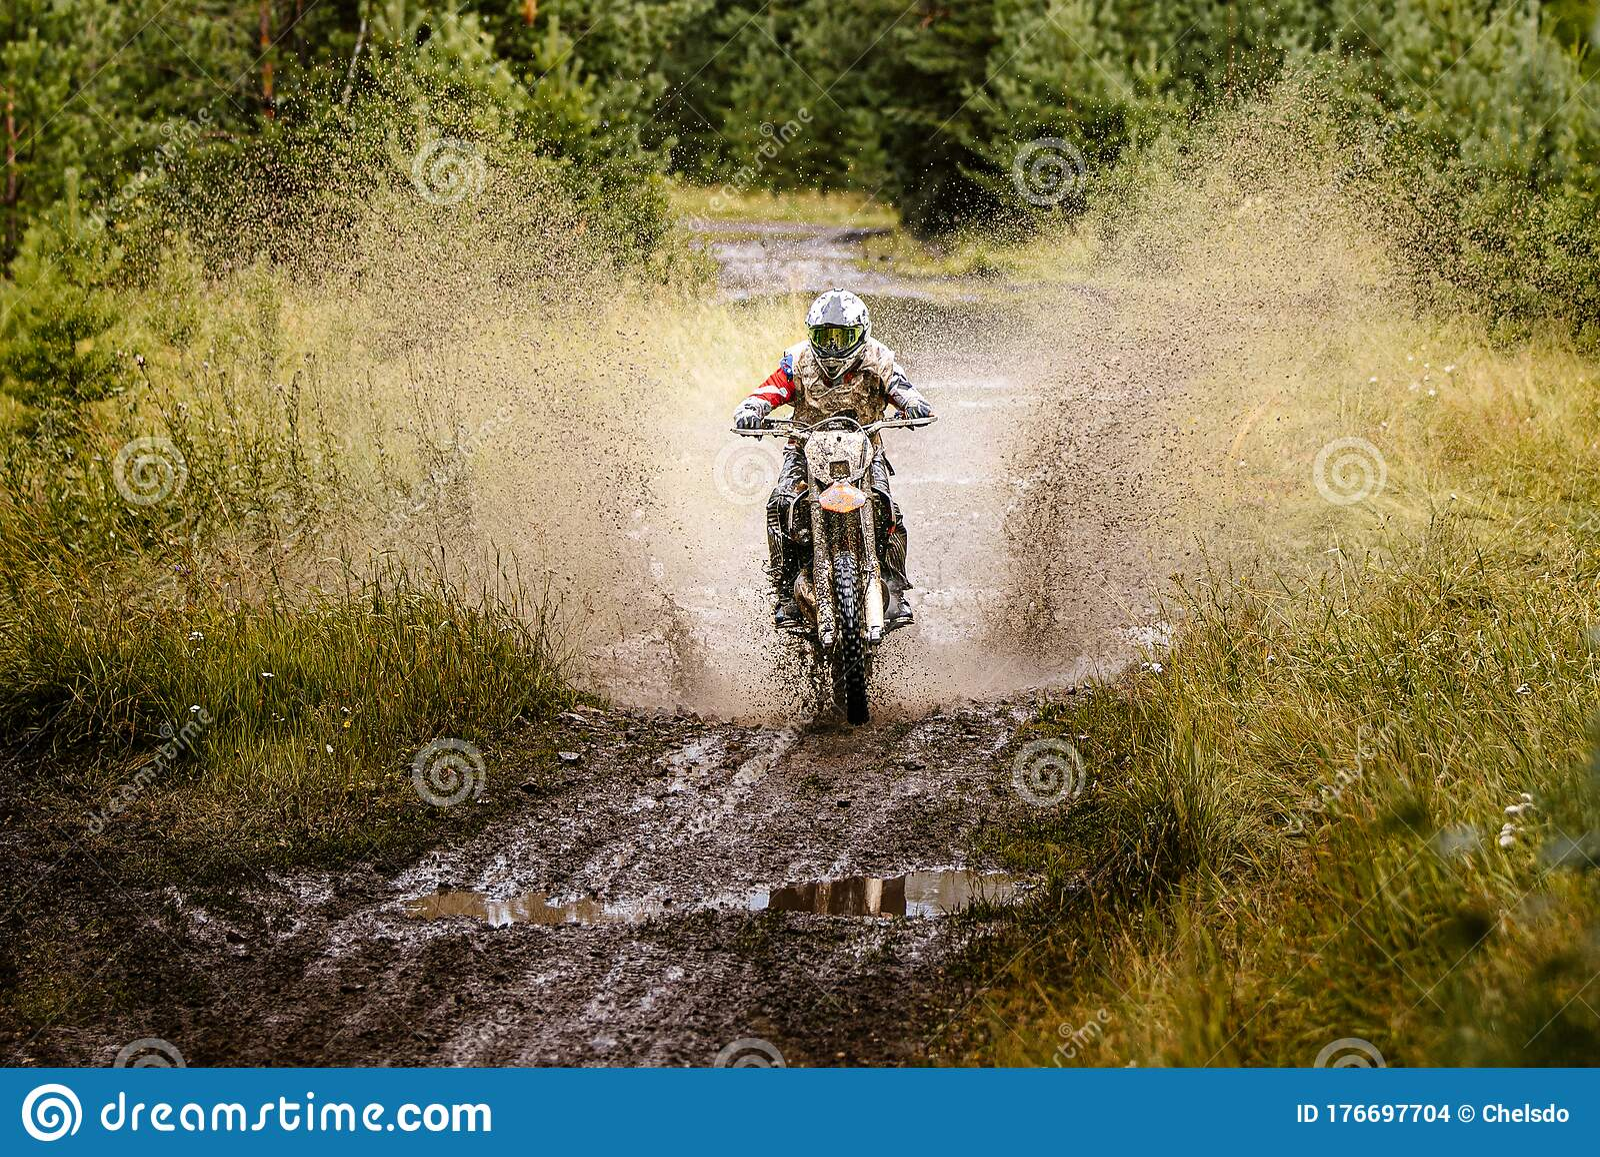 Motocross Bike Rider Rear Mud Stock Photo - Image of fling